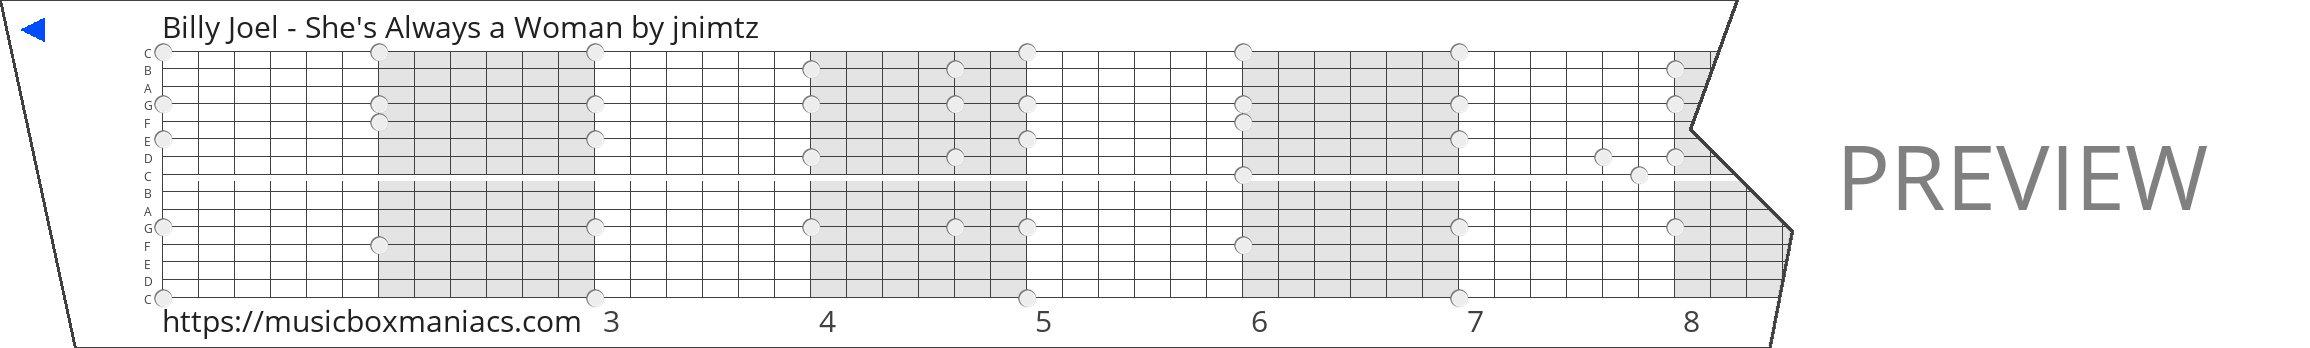 Billy Joel - She's Always a Woman 15 note music box paper strip